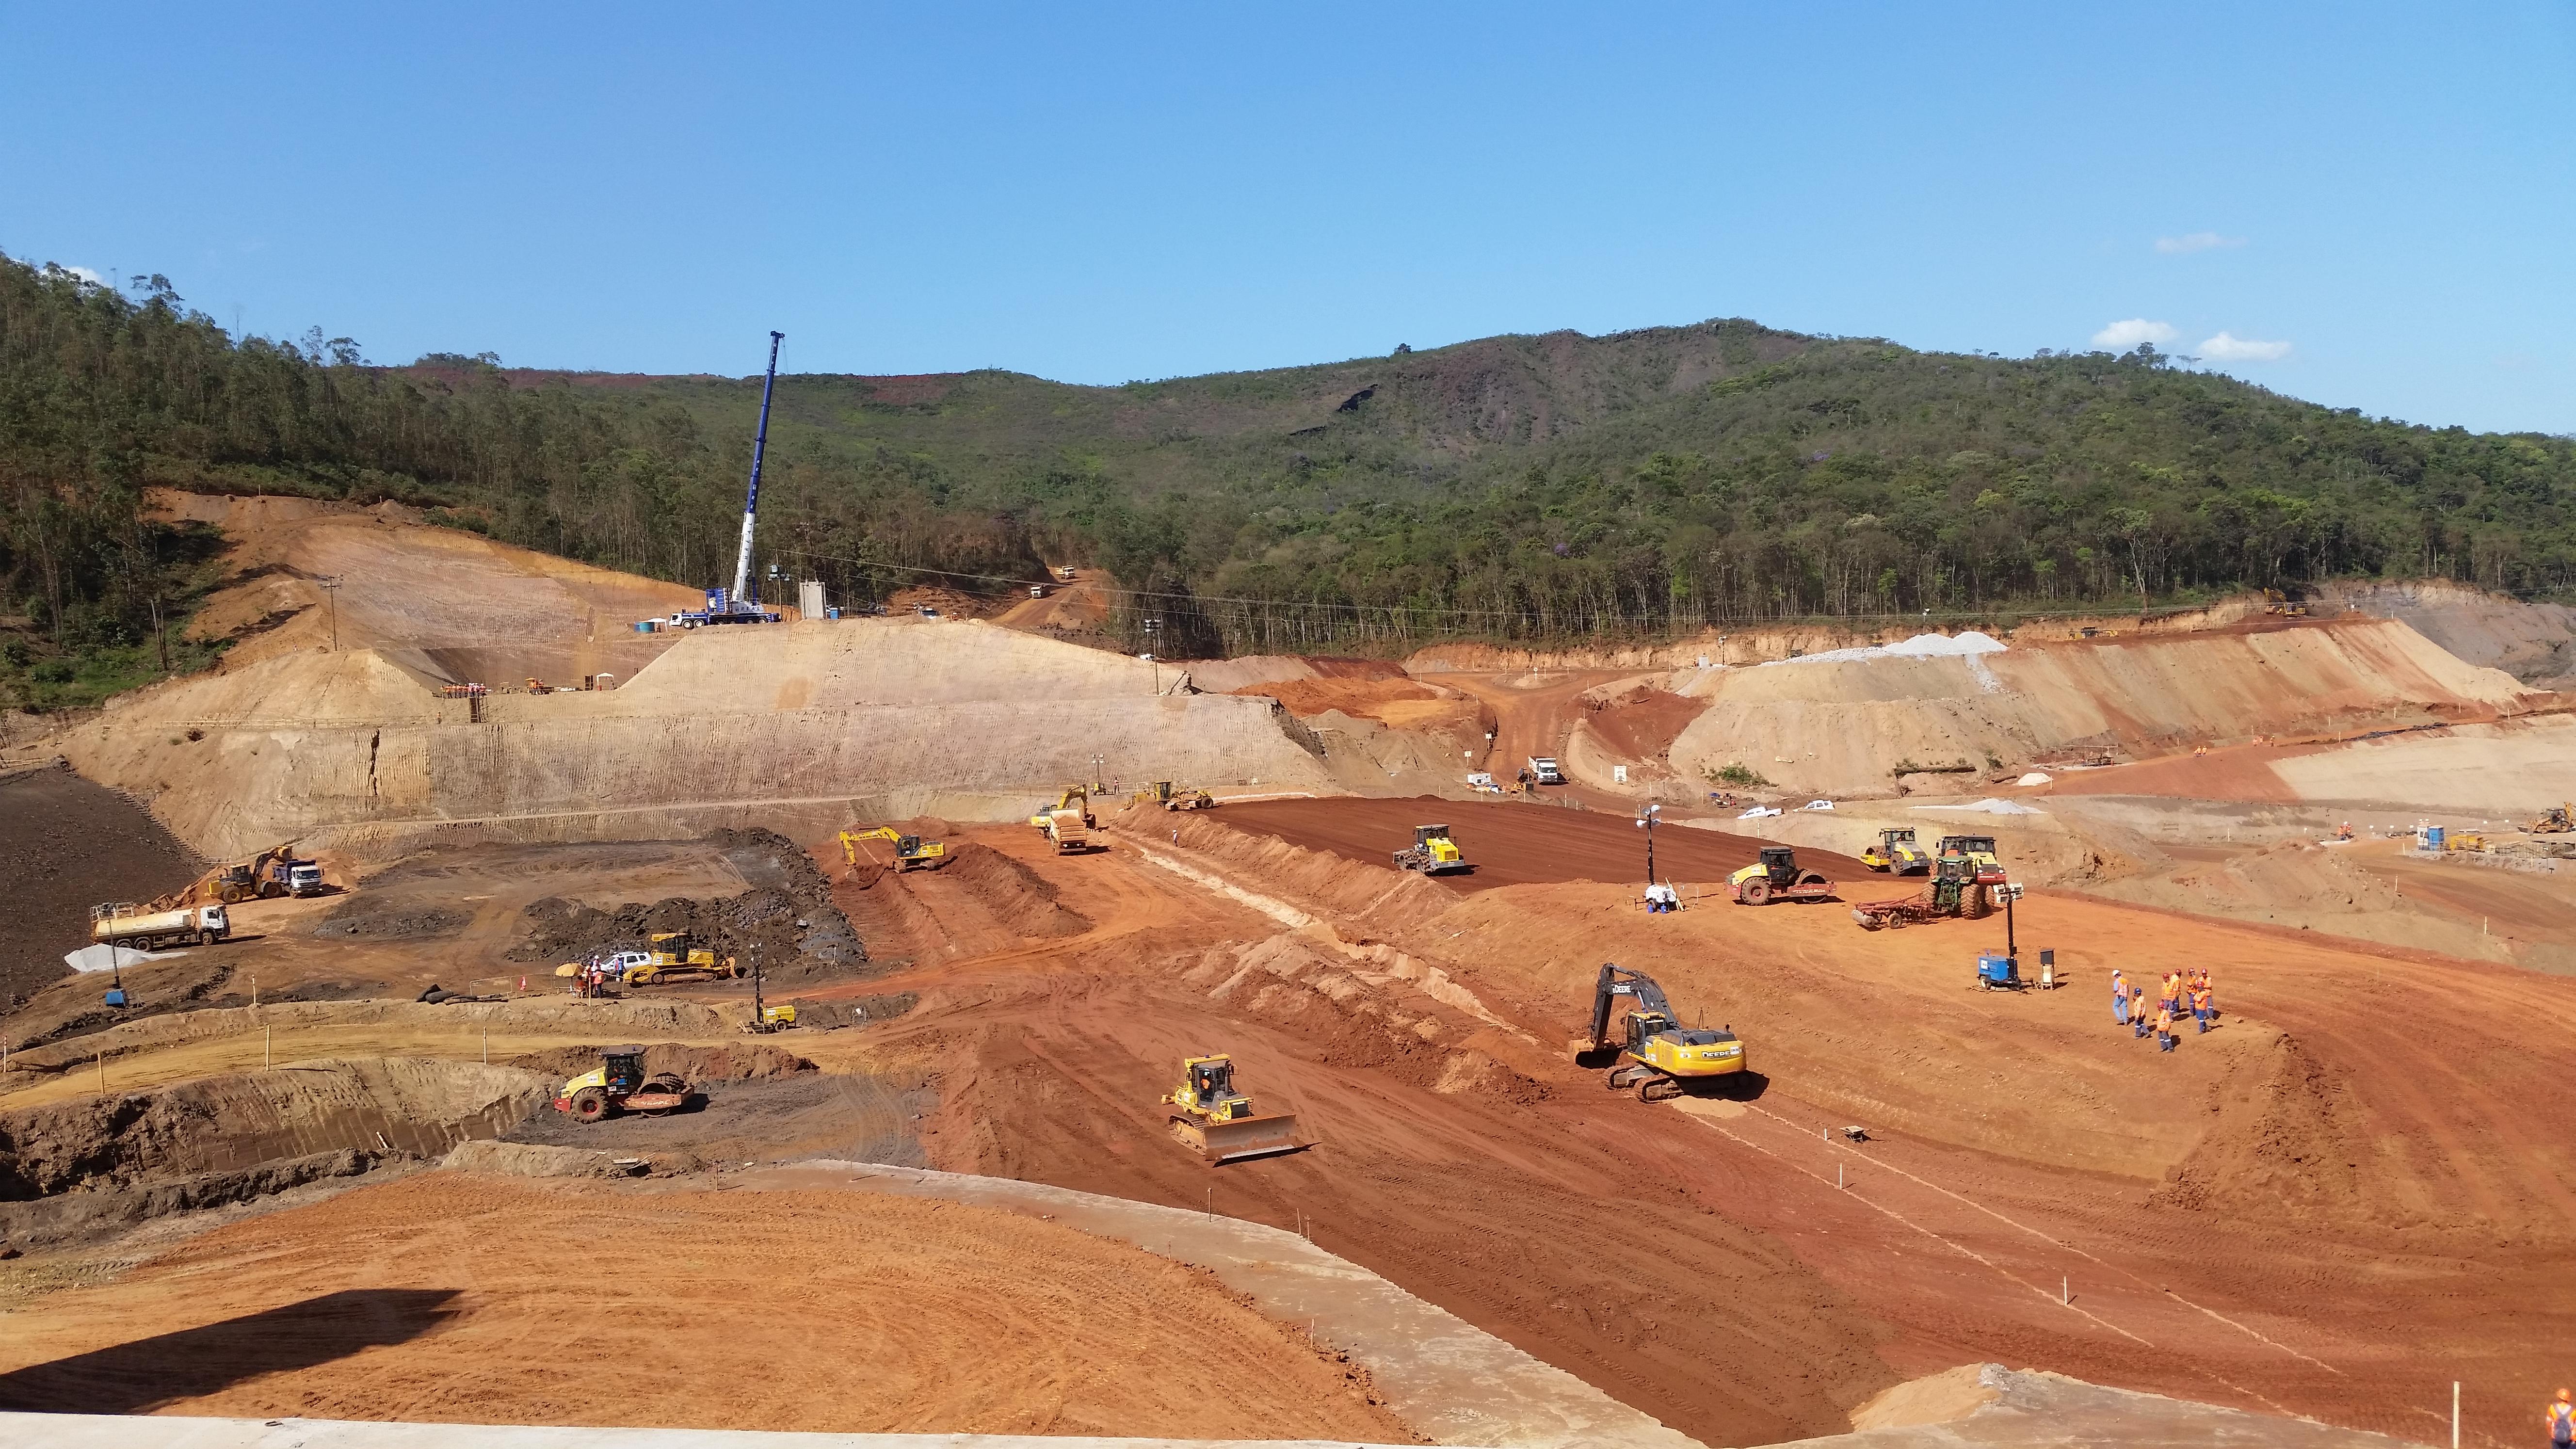 Obras da Barragem de Santarém, também atingida pela lama